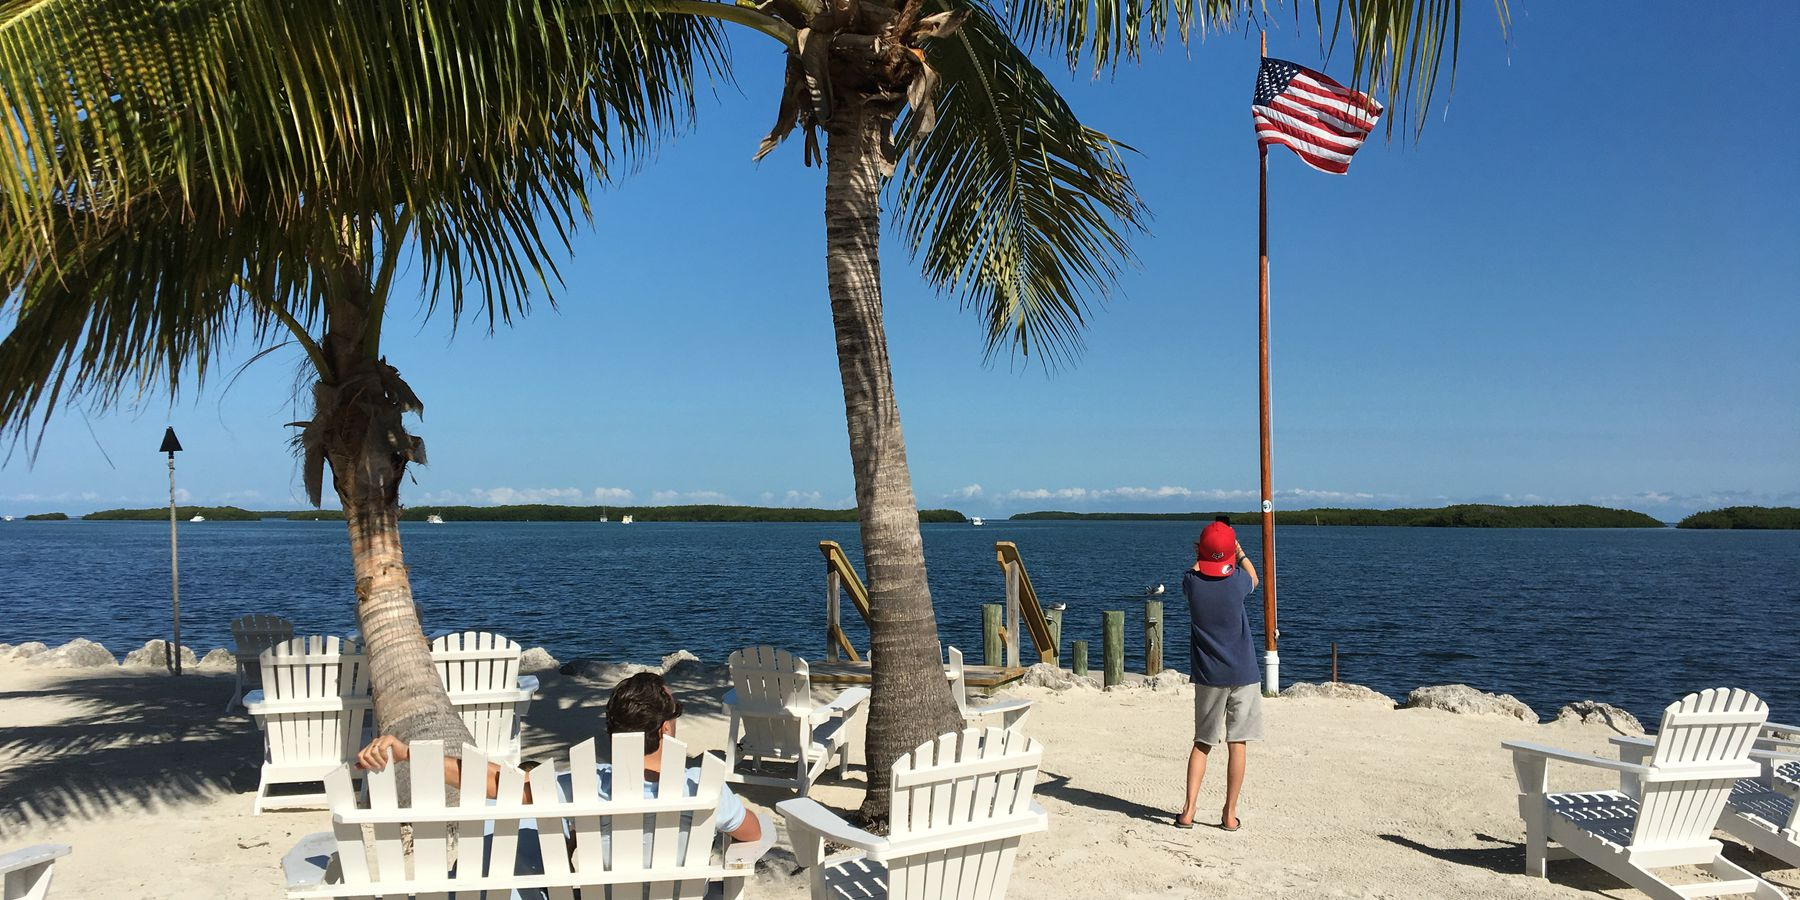 Morada Bay - The Keys - Florida - Doets Reizen